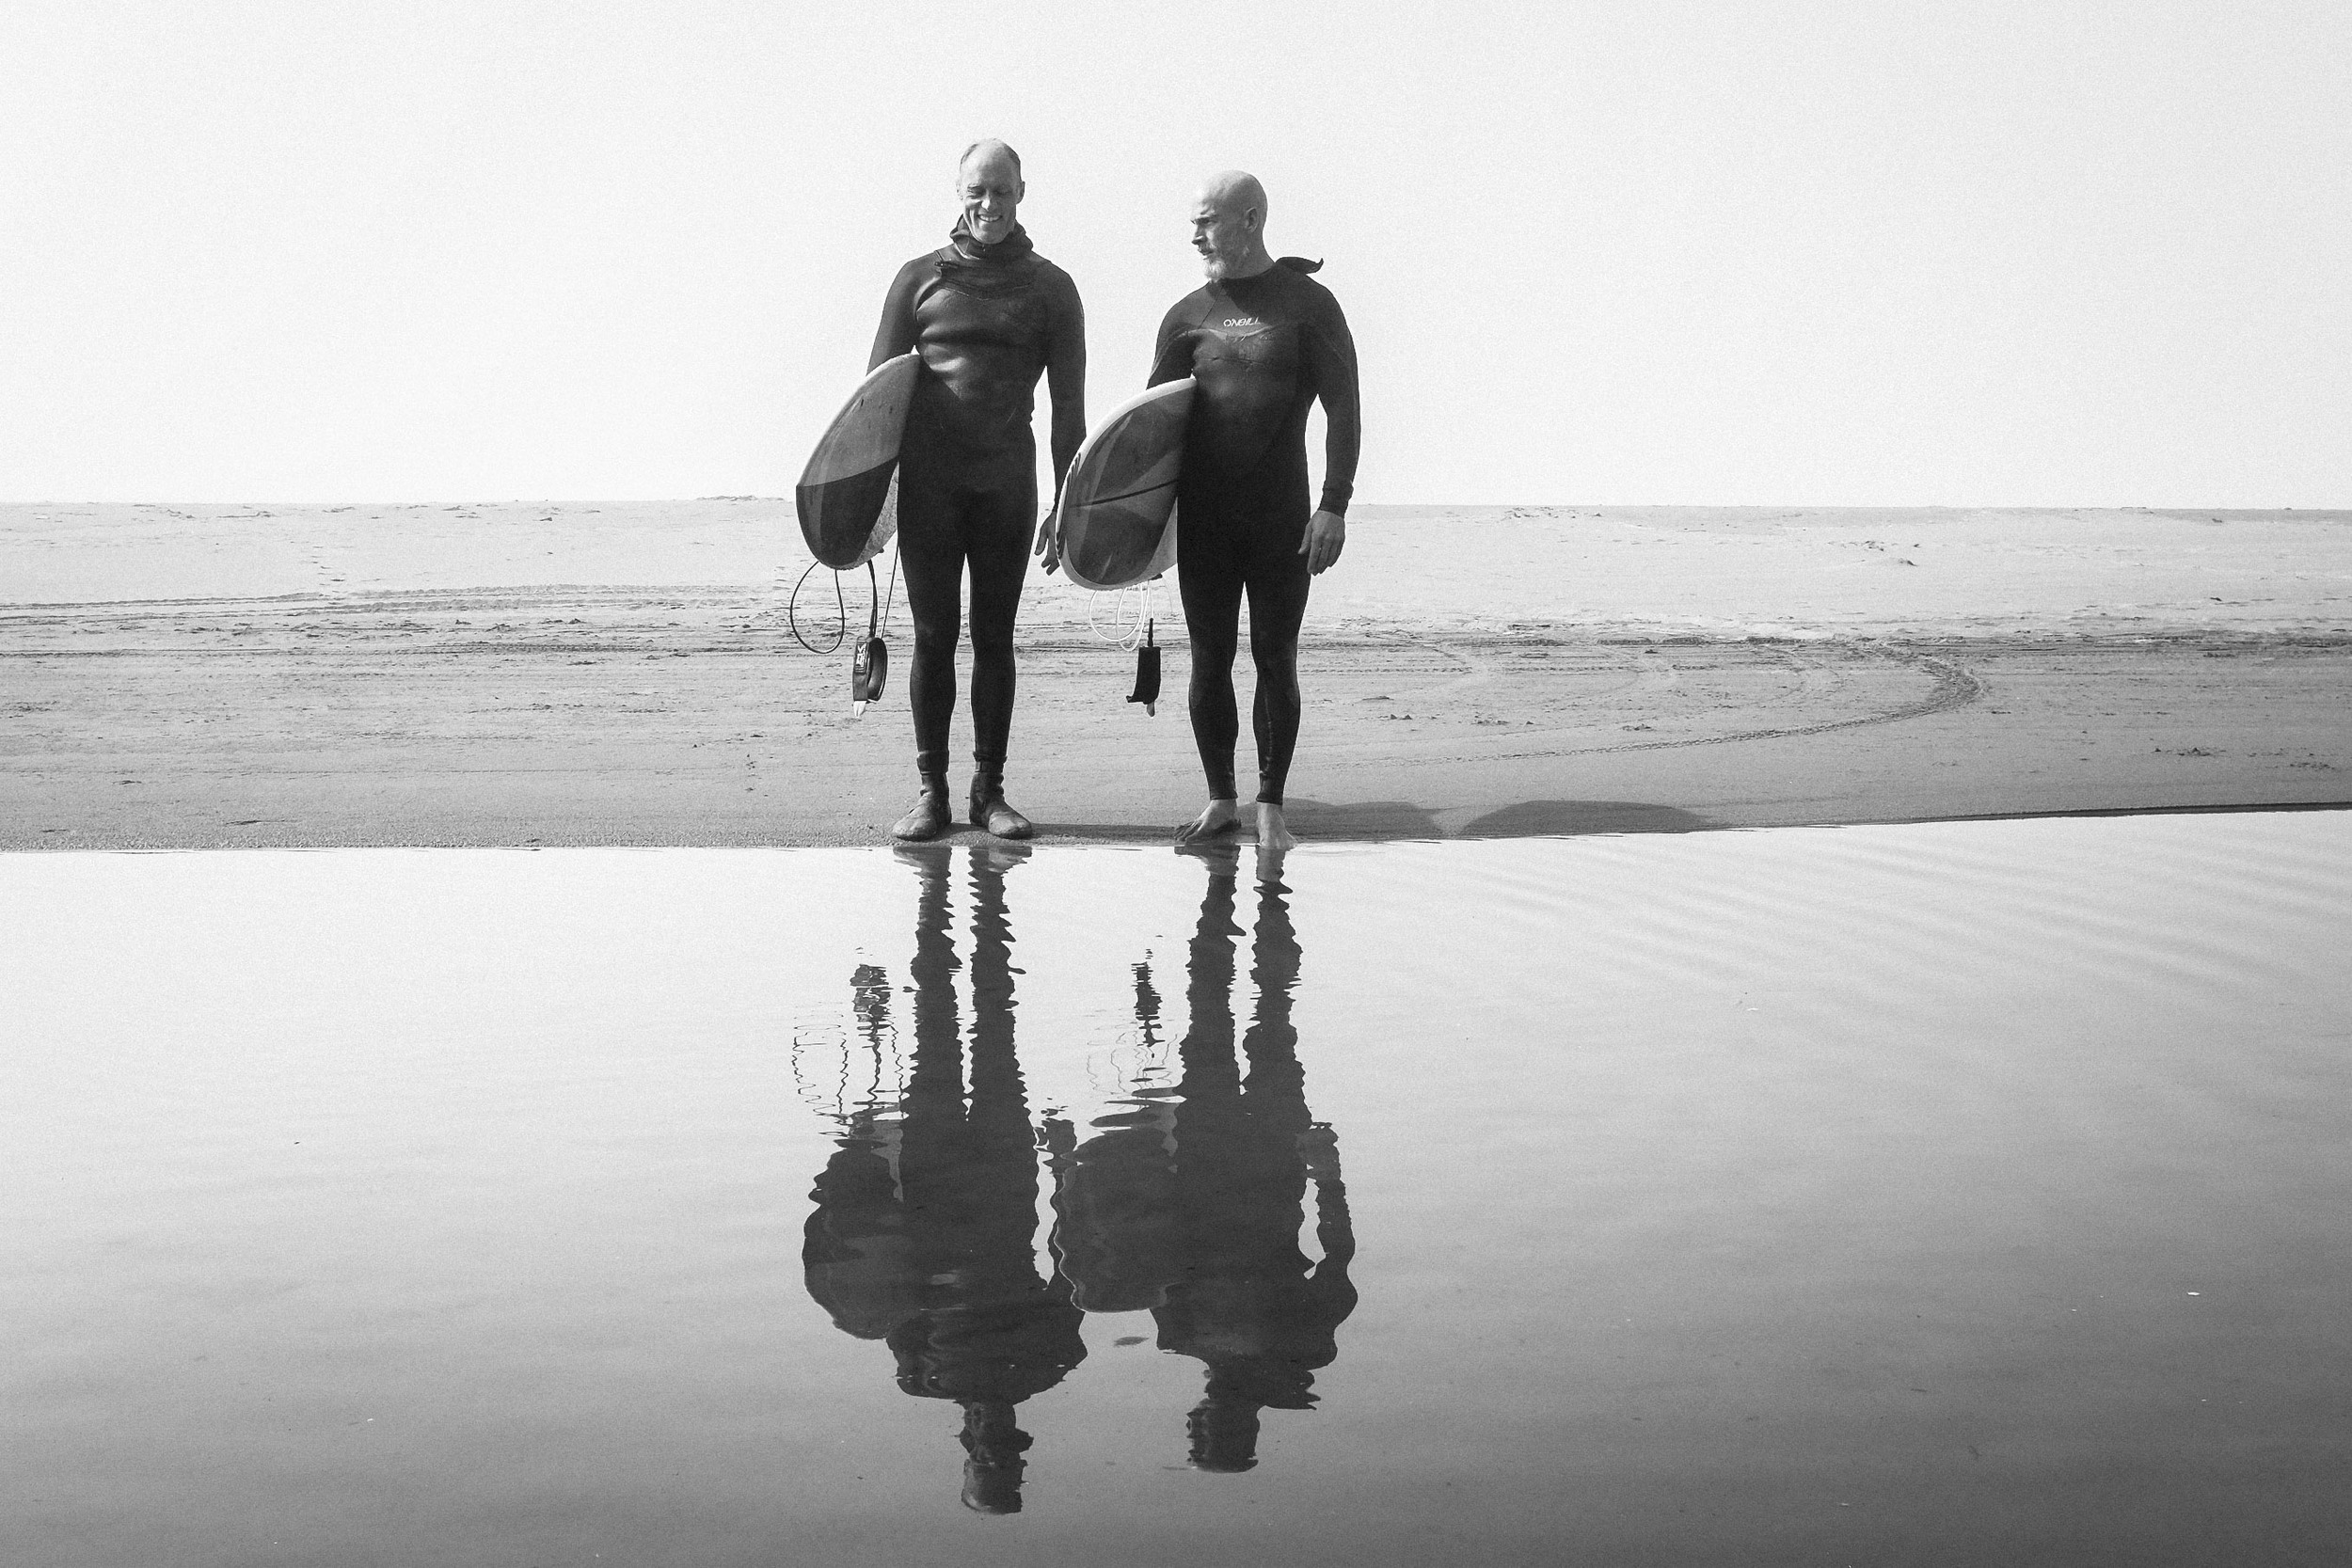 Black-Bear-Brand-Tilley-Surfboards-Water-Testing-06.jpg